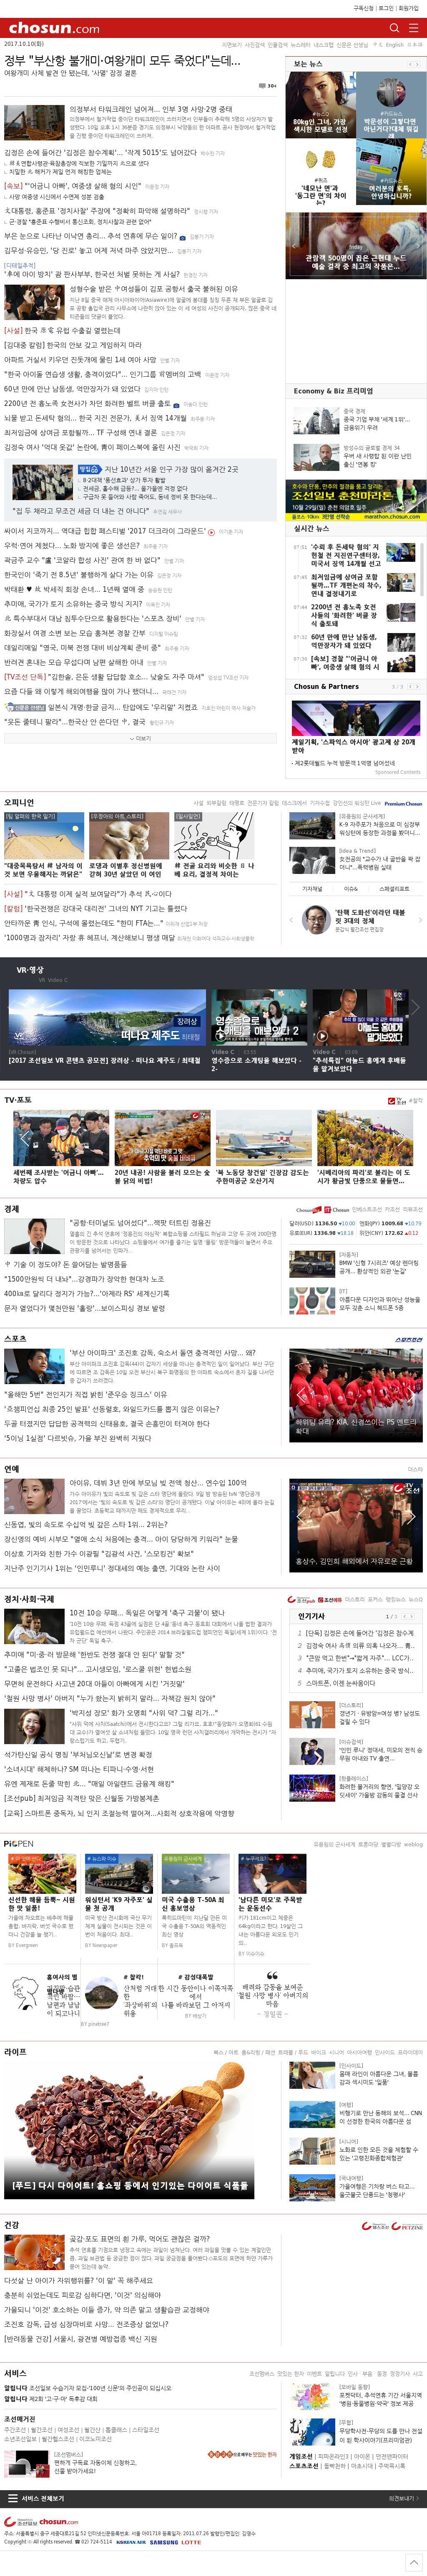 chosun.com at Tuesday Oct. 10, 2017, 8:01 a.m. UTC